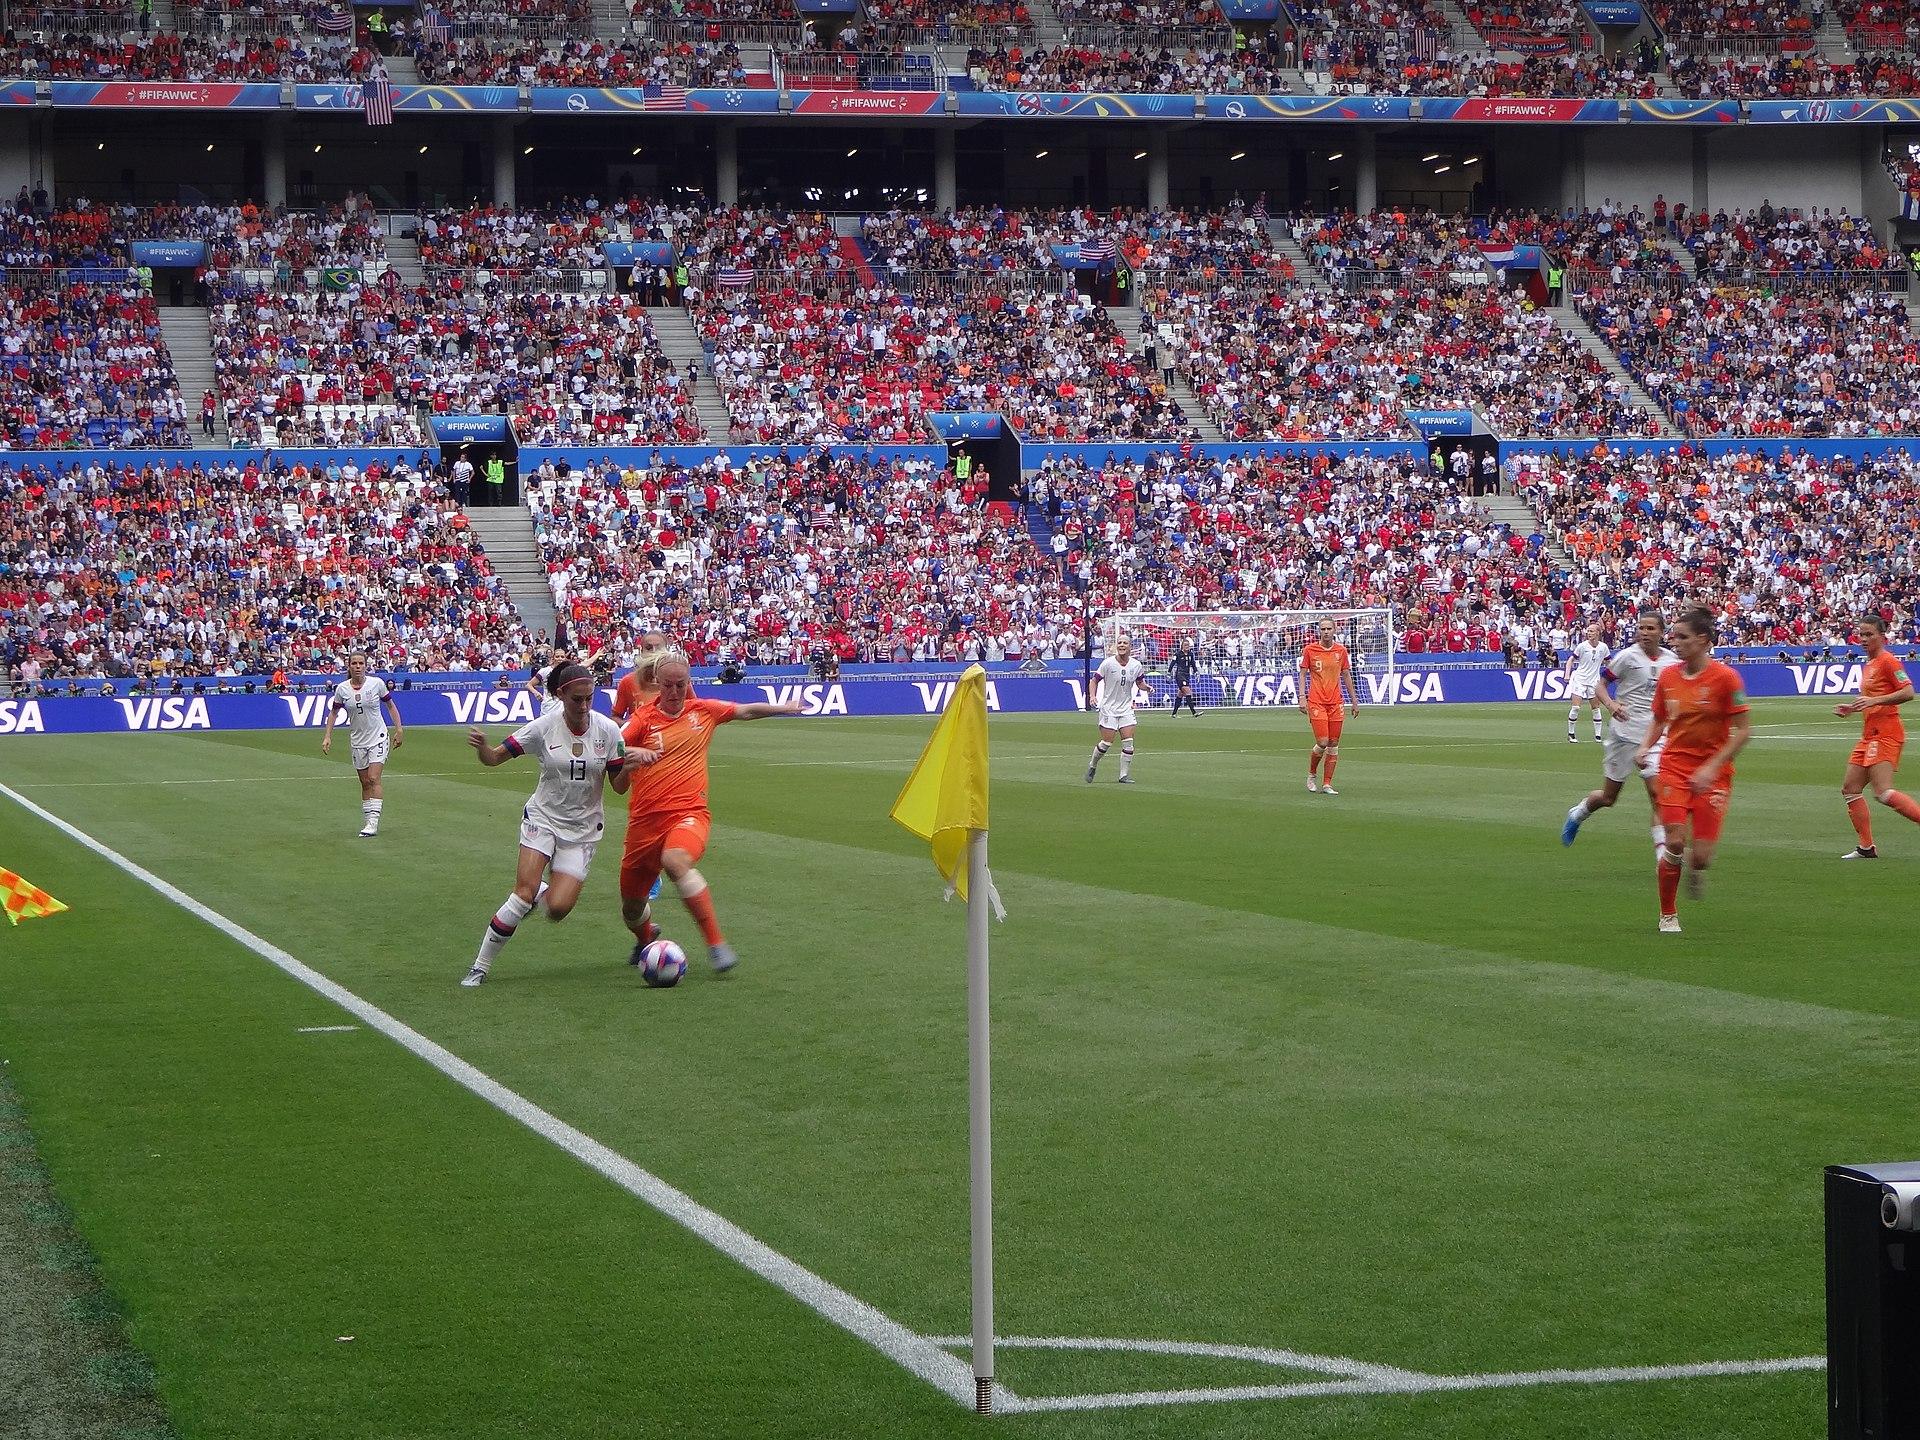 FIFA Women's World Cup 2019 Final - Alex Morgan and Stefanie van der Gragt.jpg